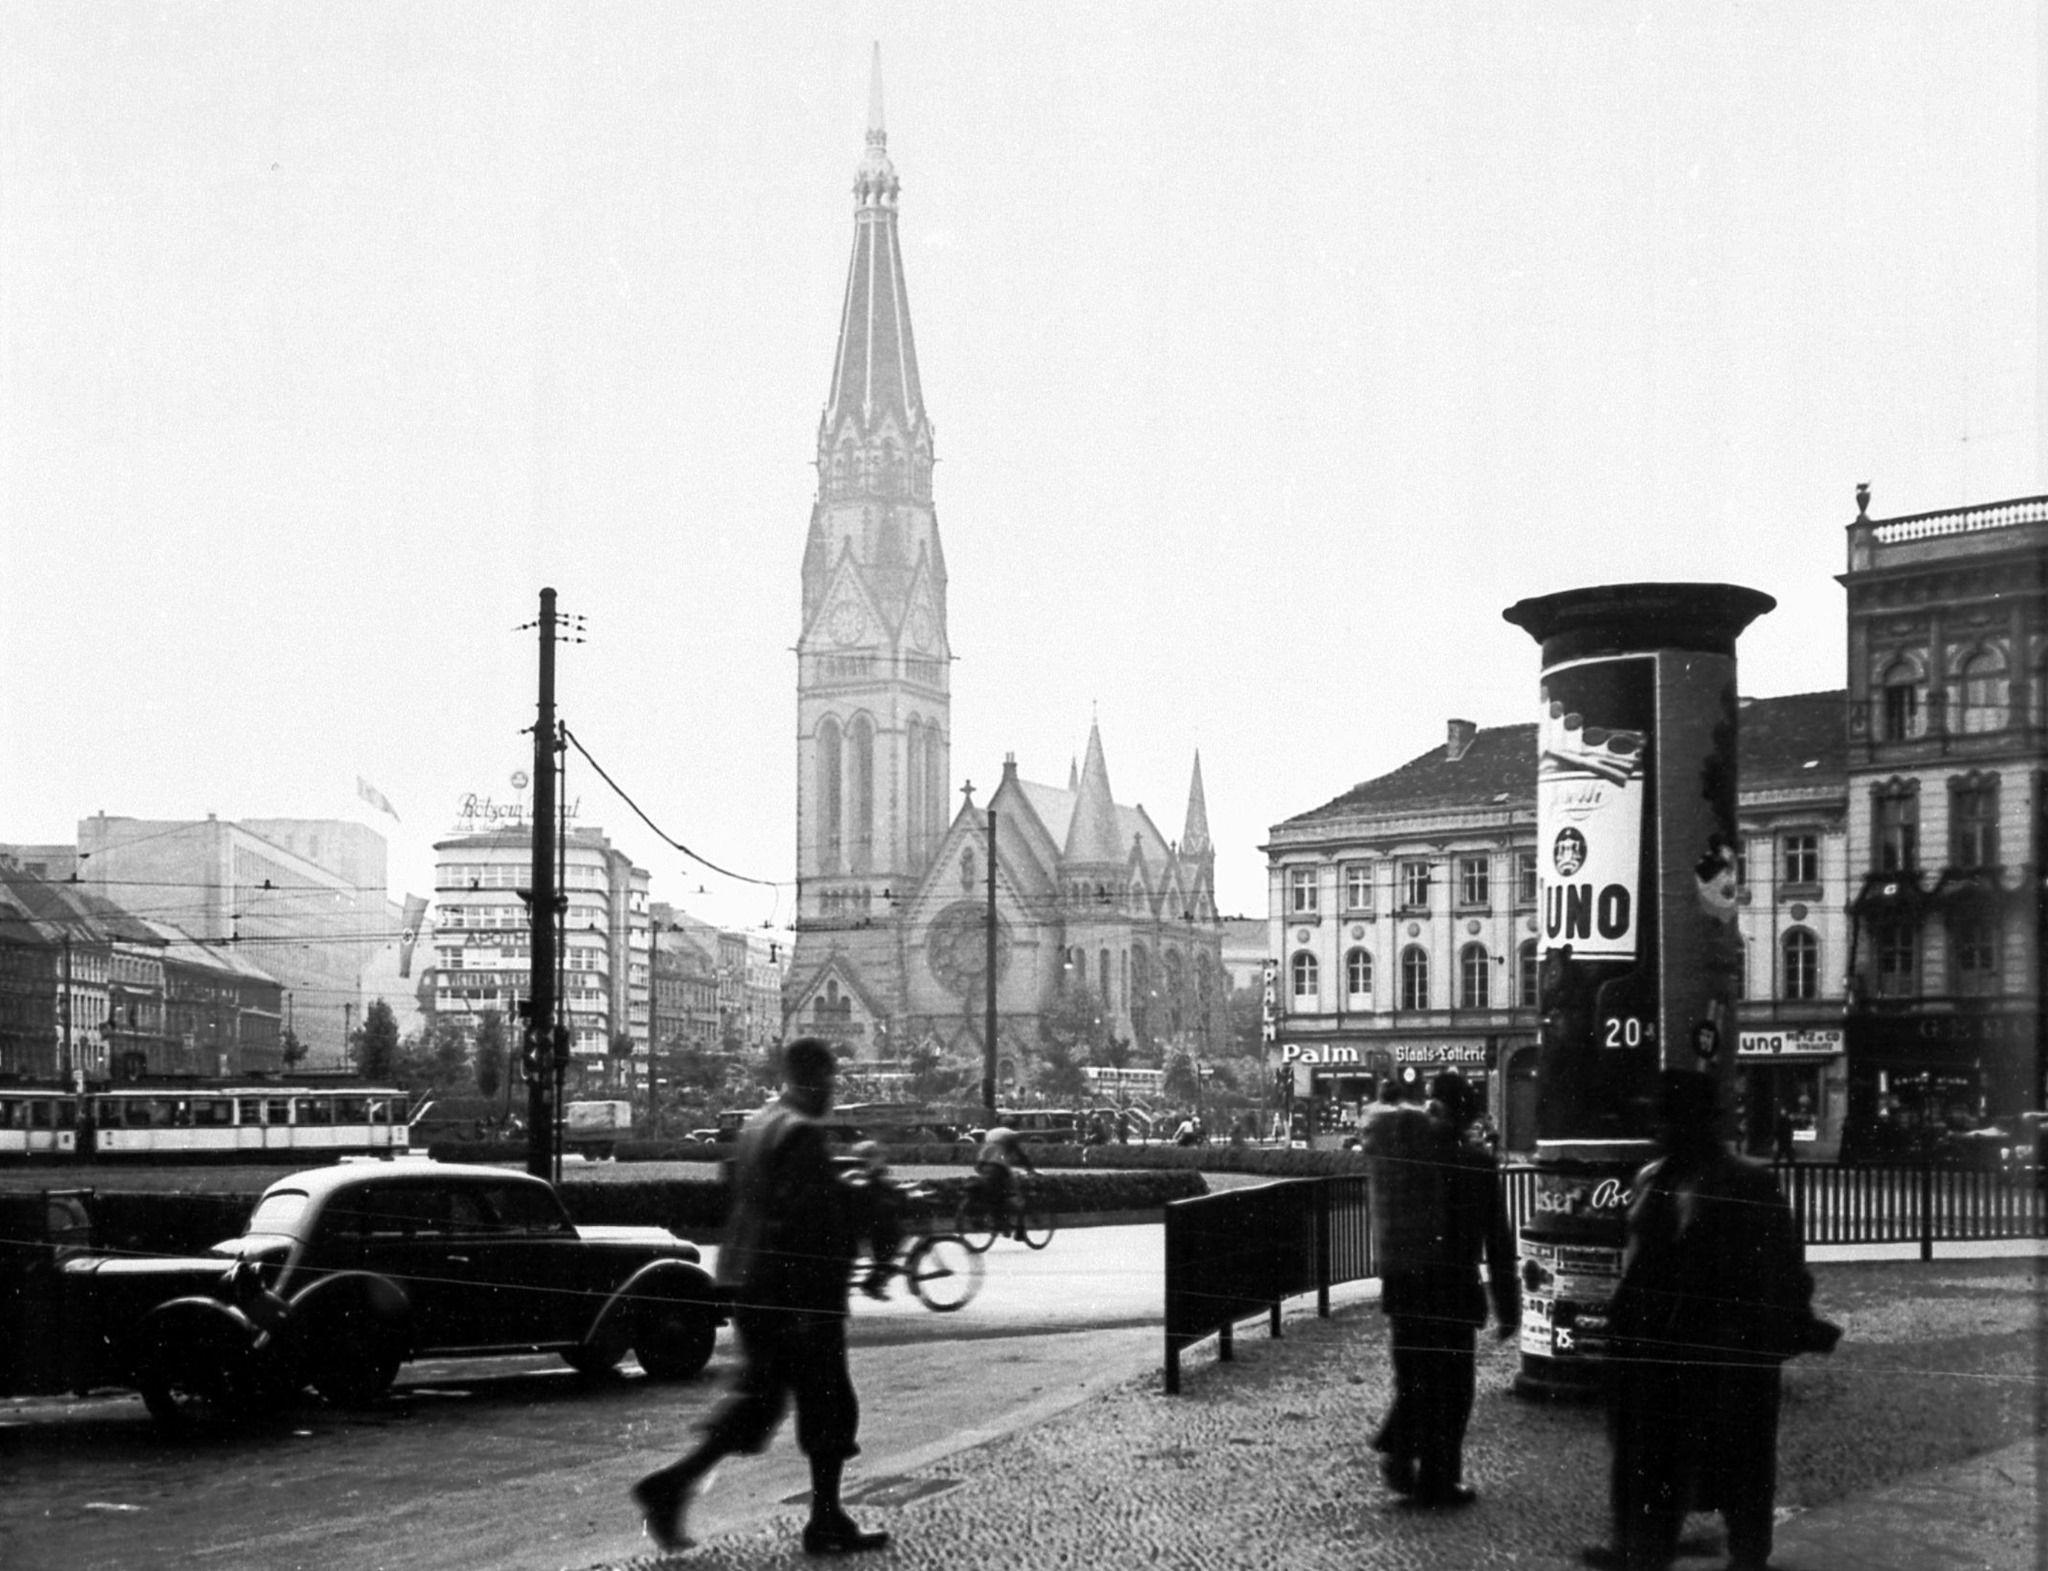 Links Hinten Statistisches Reichsamt 1935 Berlin Alexanderplatz Minolhaus Georgenkirche Berlin Verwaltungsgebaude Gebaude